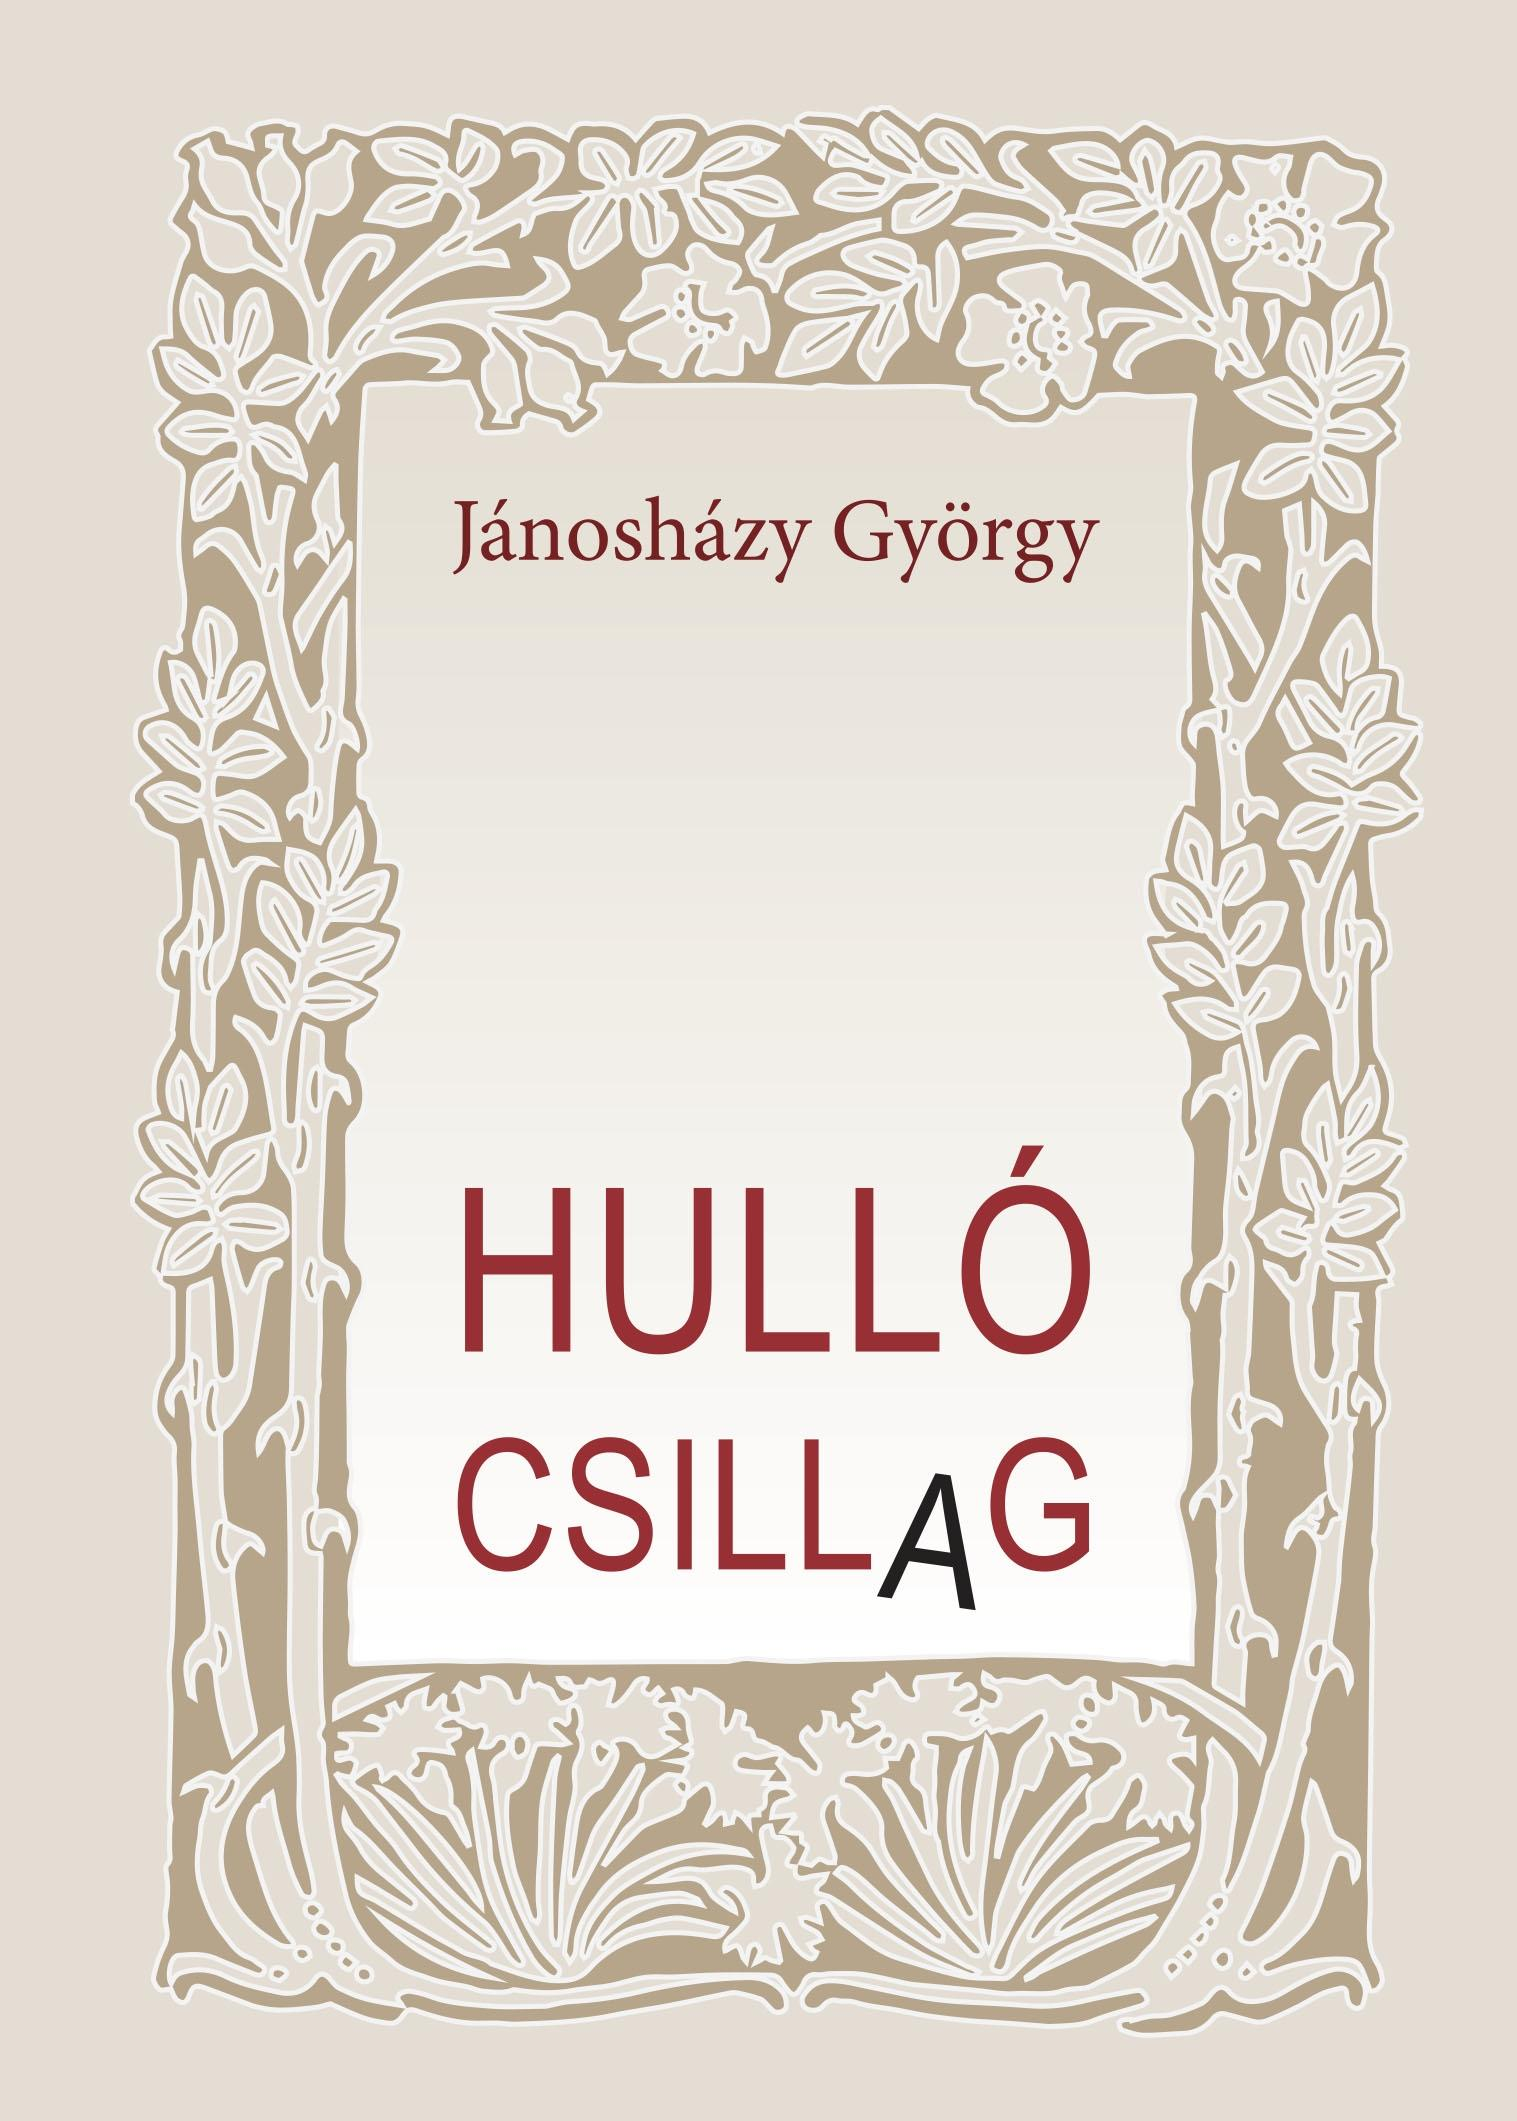 HULLÓ CSILLAG